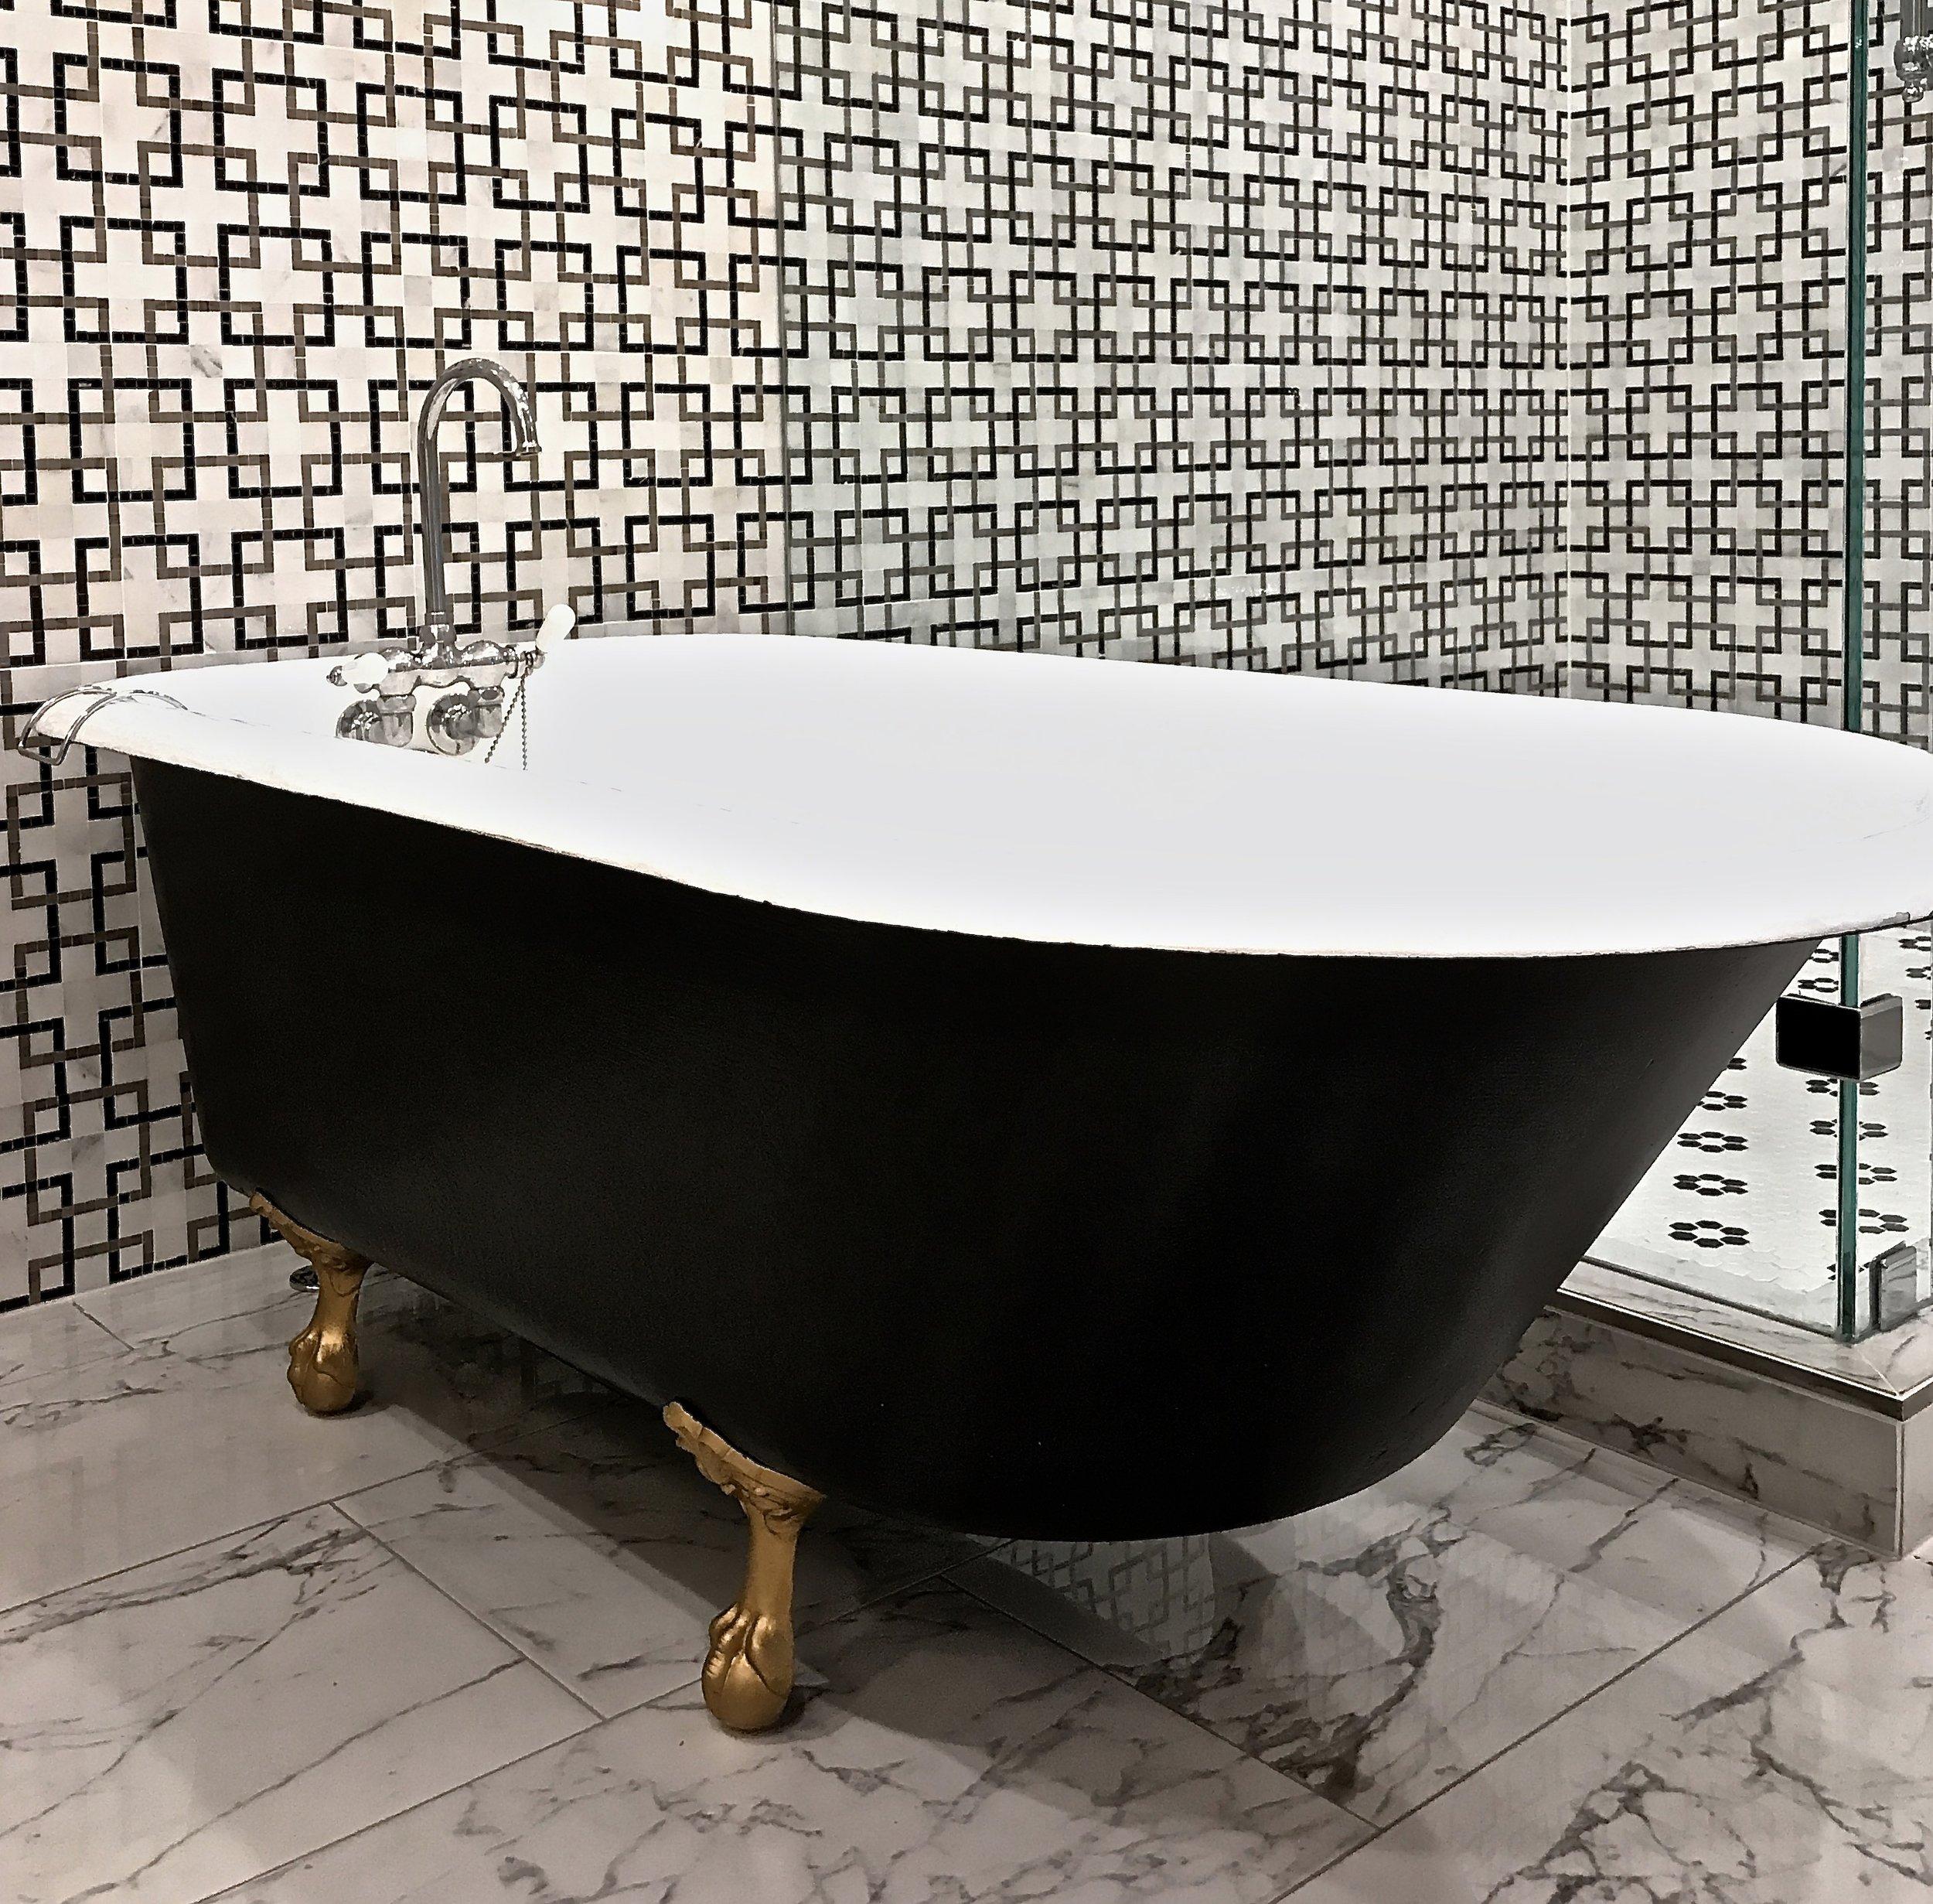 Refinished claw foot bath tub- an updated original.